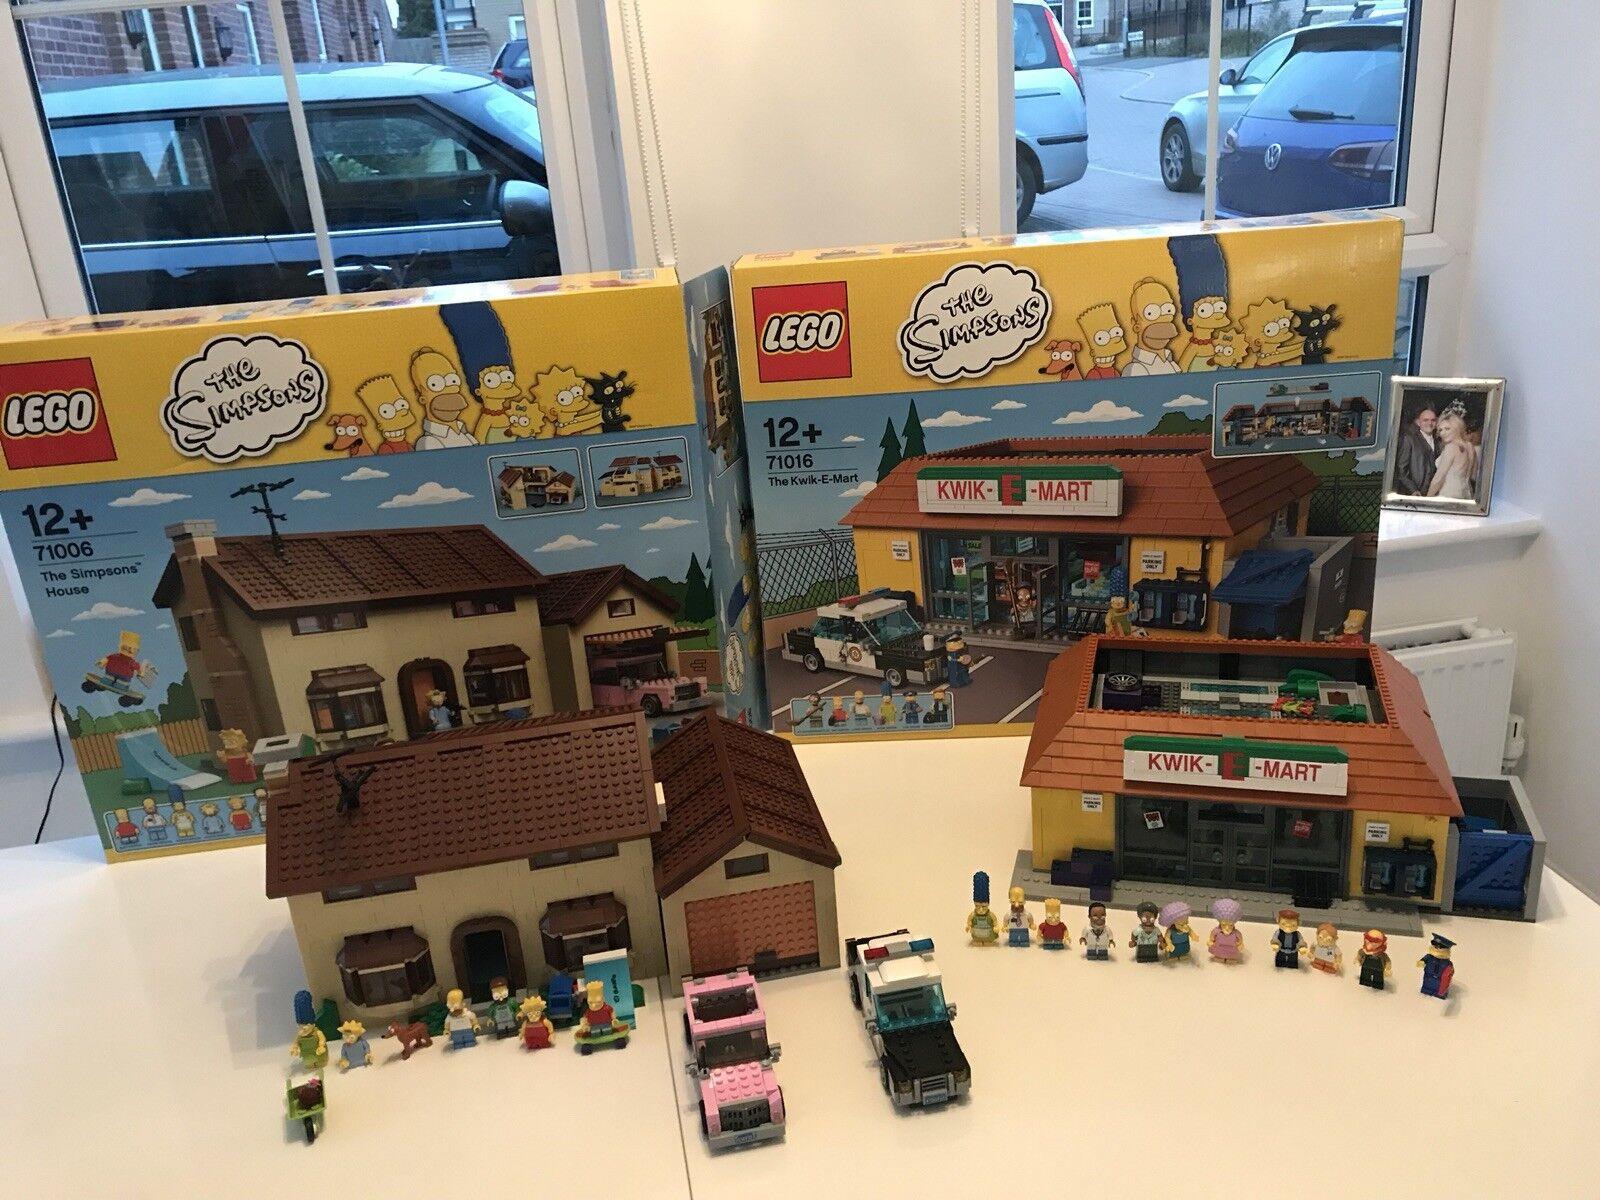 Los Simpsons Lego House y Kiwk E Mart